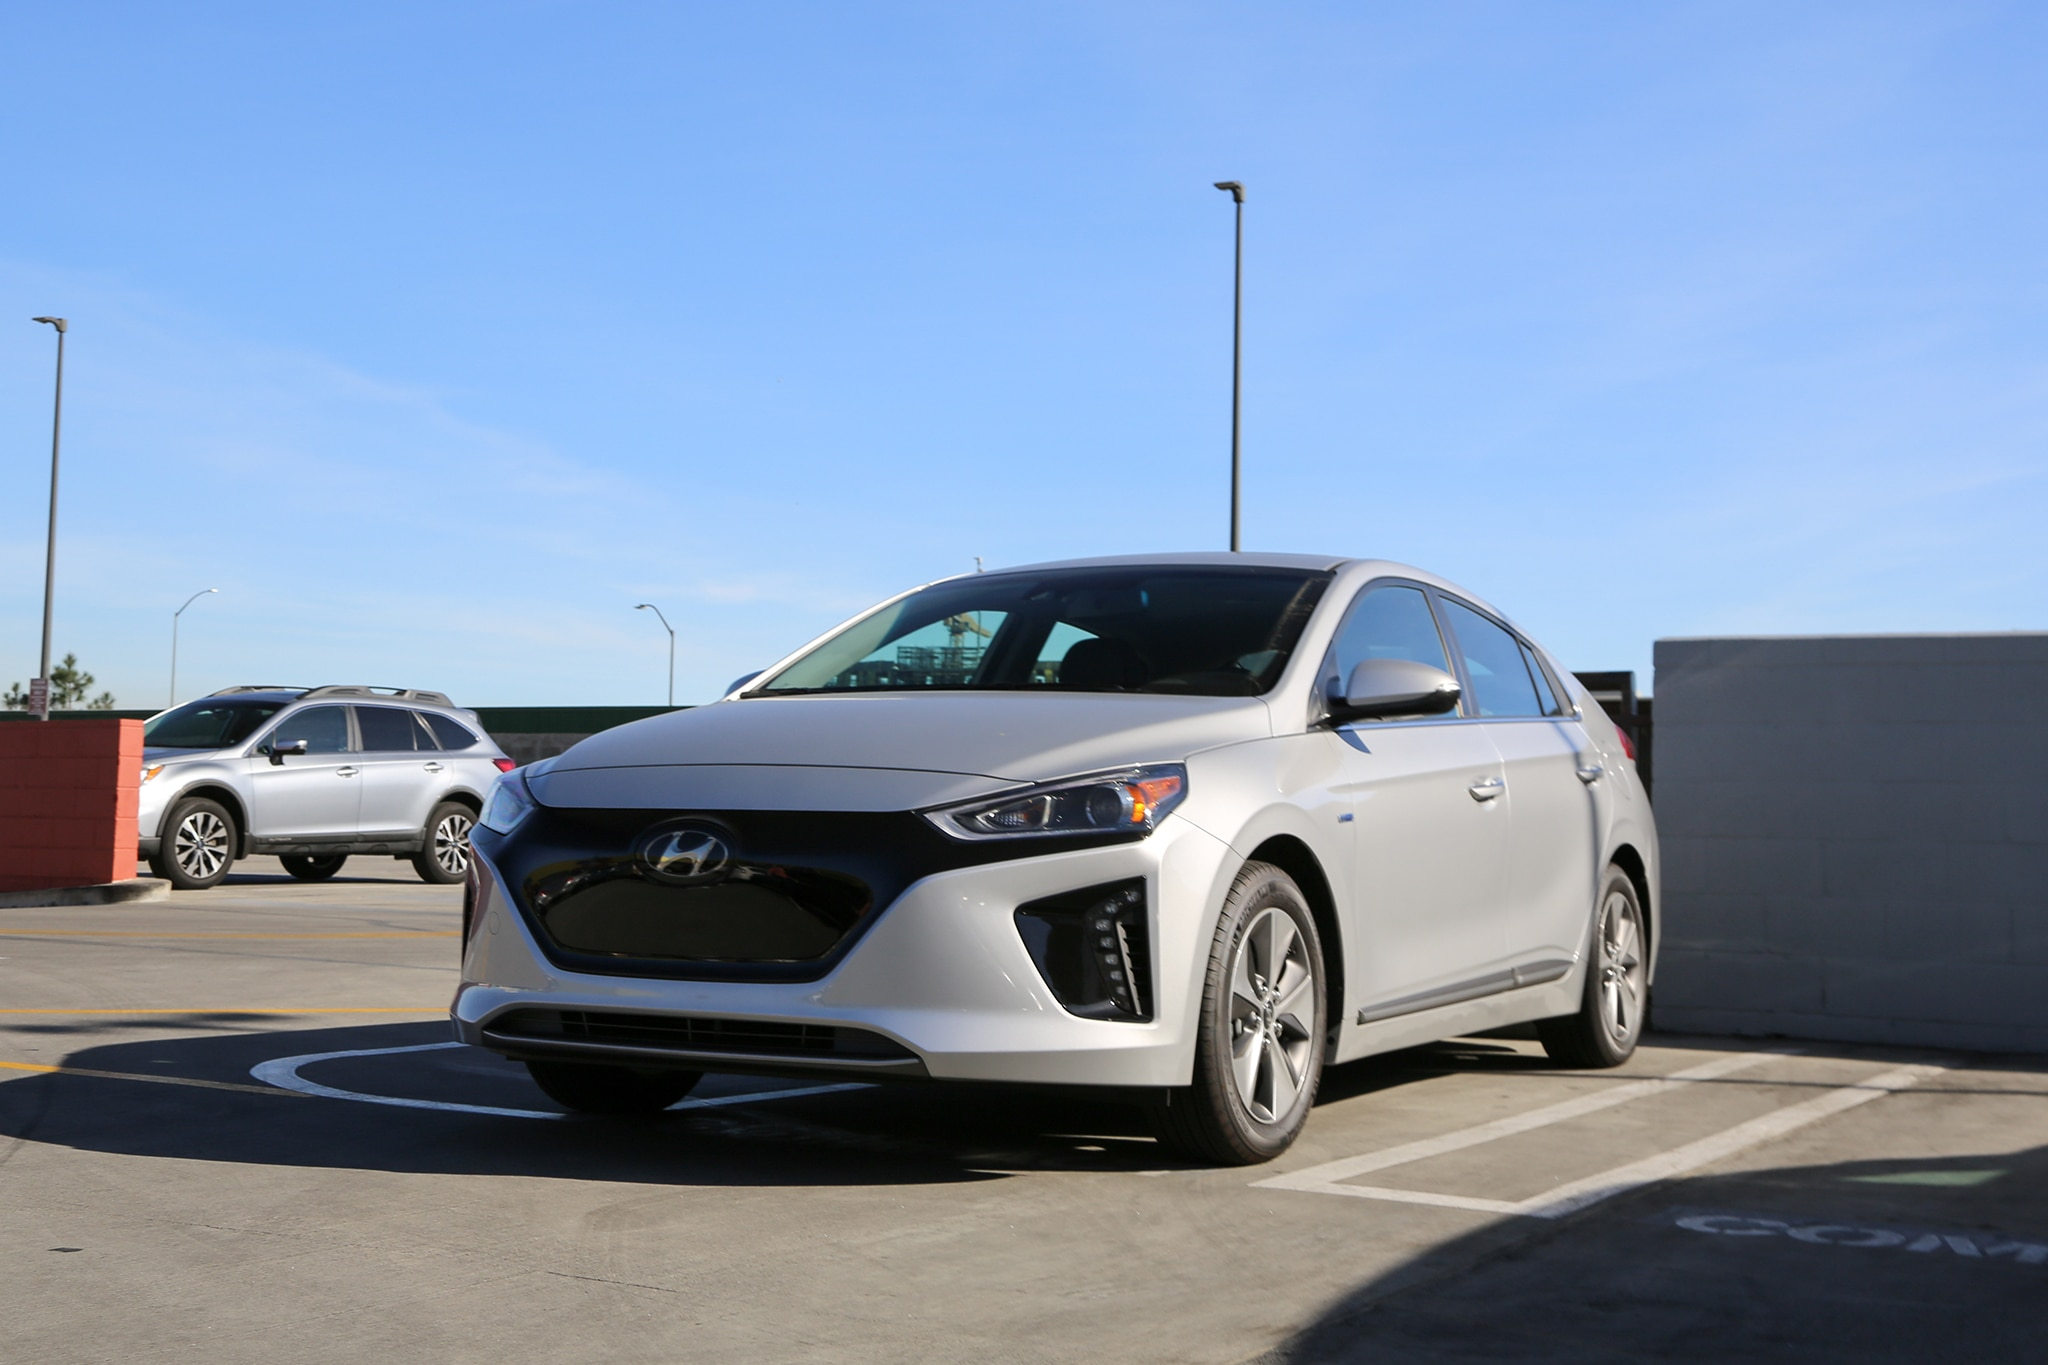 2019 Hyundai Ioniq Electric EV Review: Serene Simplicity   Automobile Magazine